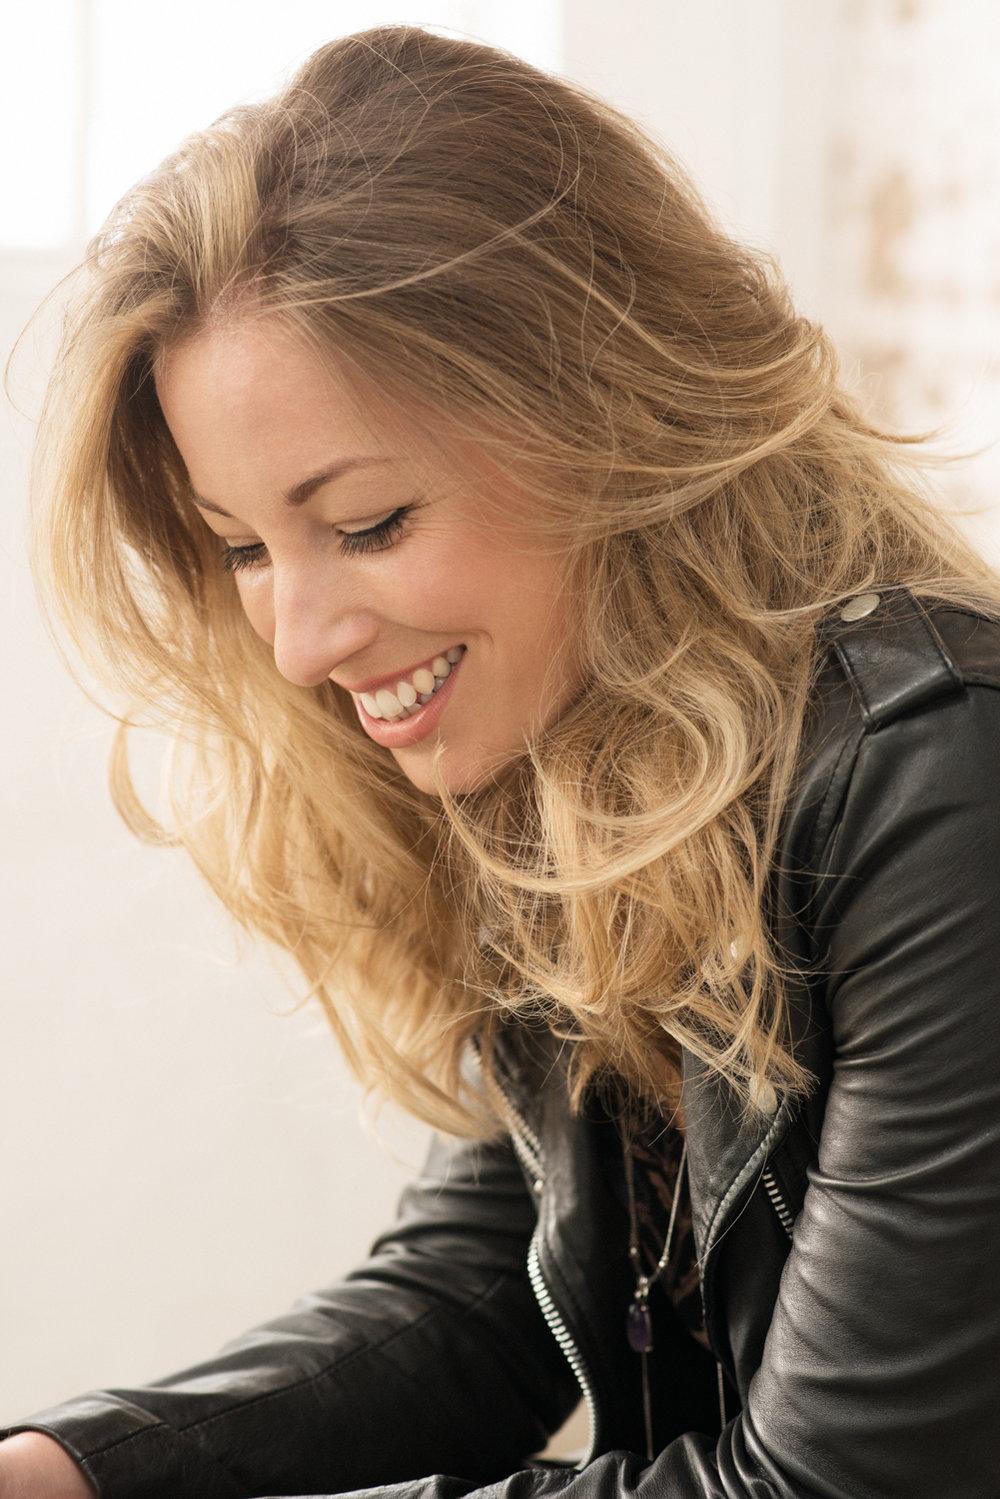 Lauren_Ray-Promo Pic2.jpg